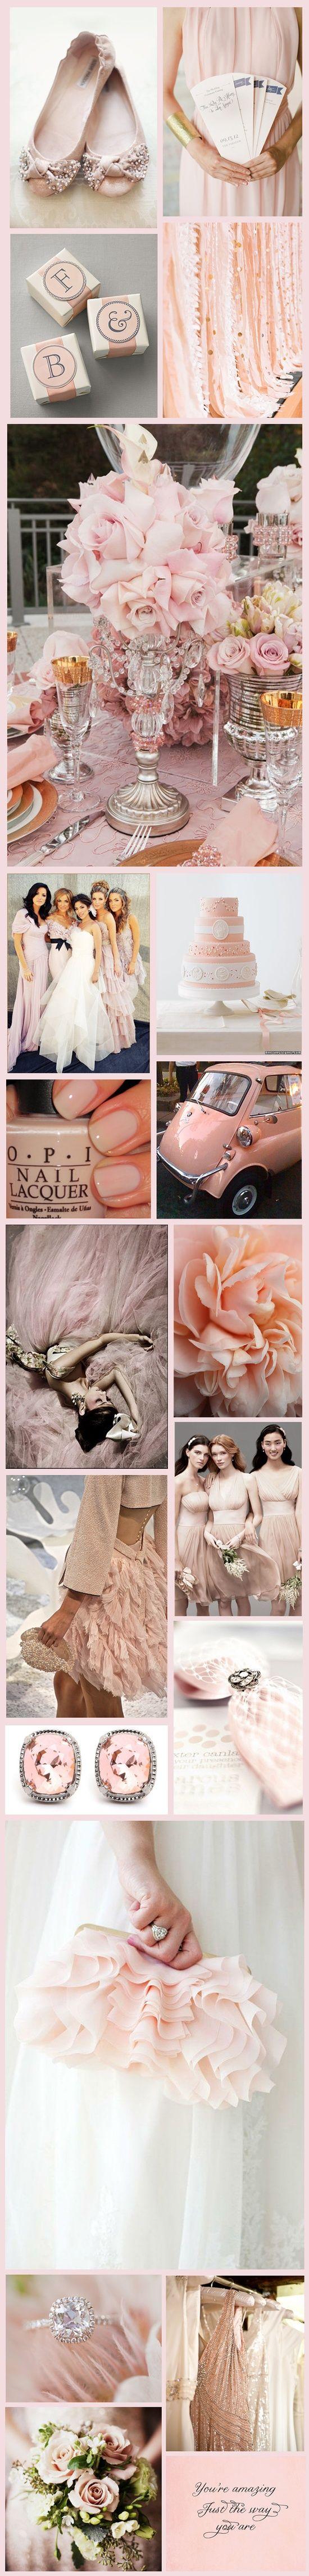 powder pink inspiration and mood board